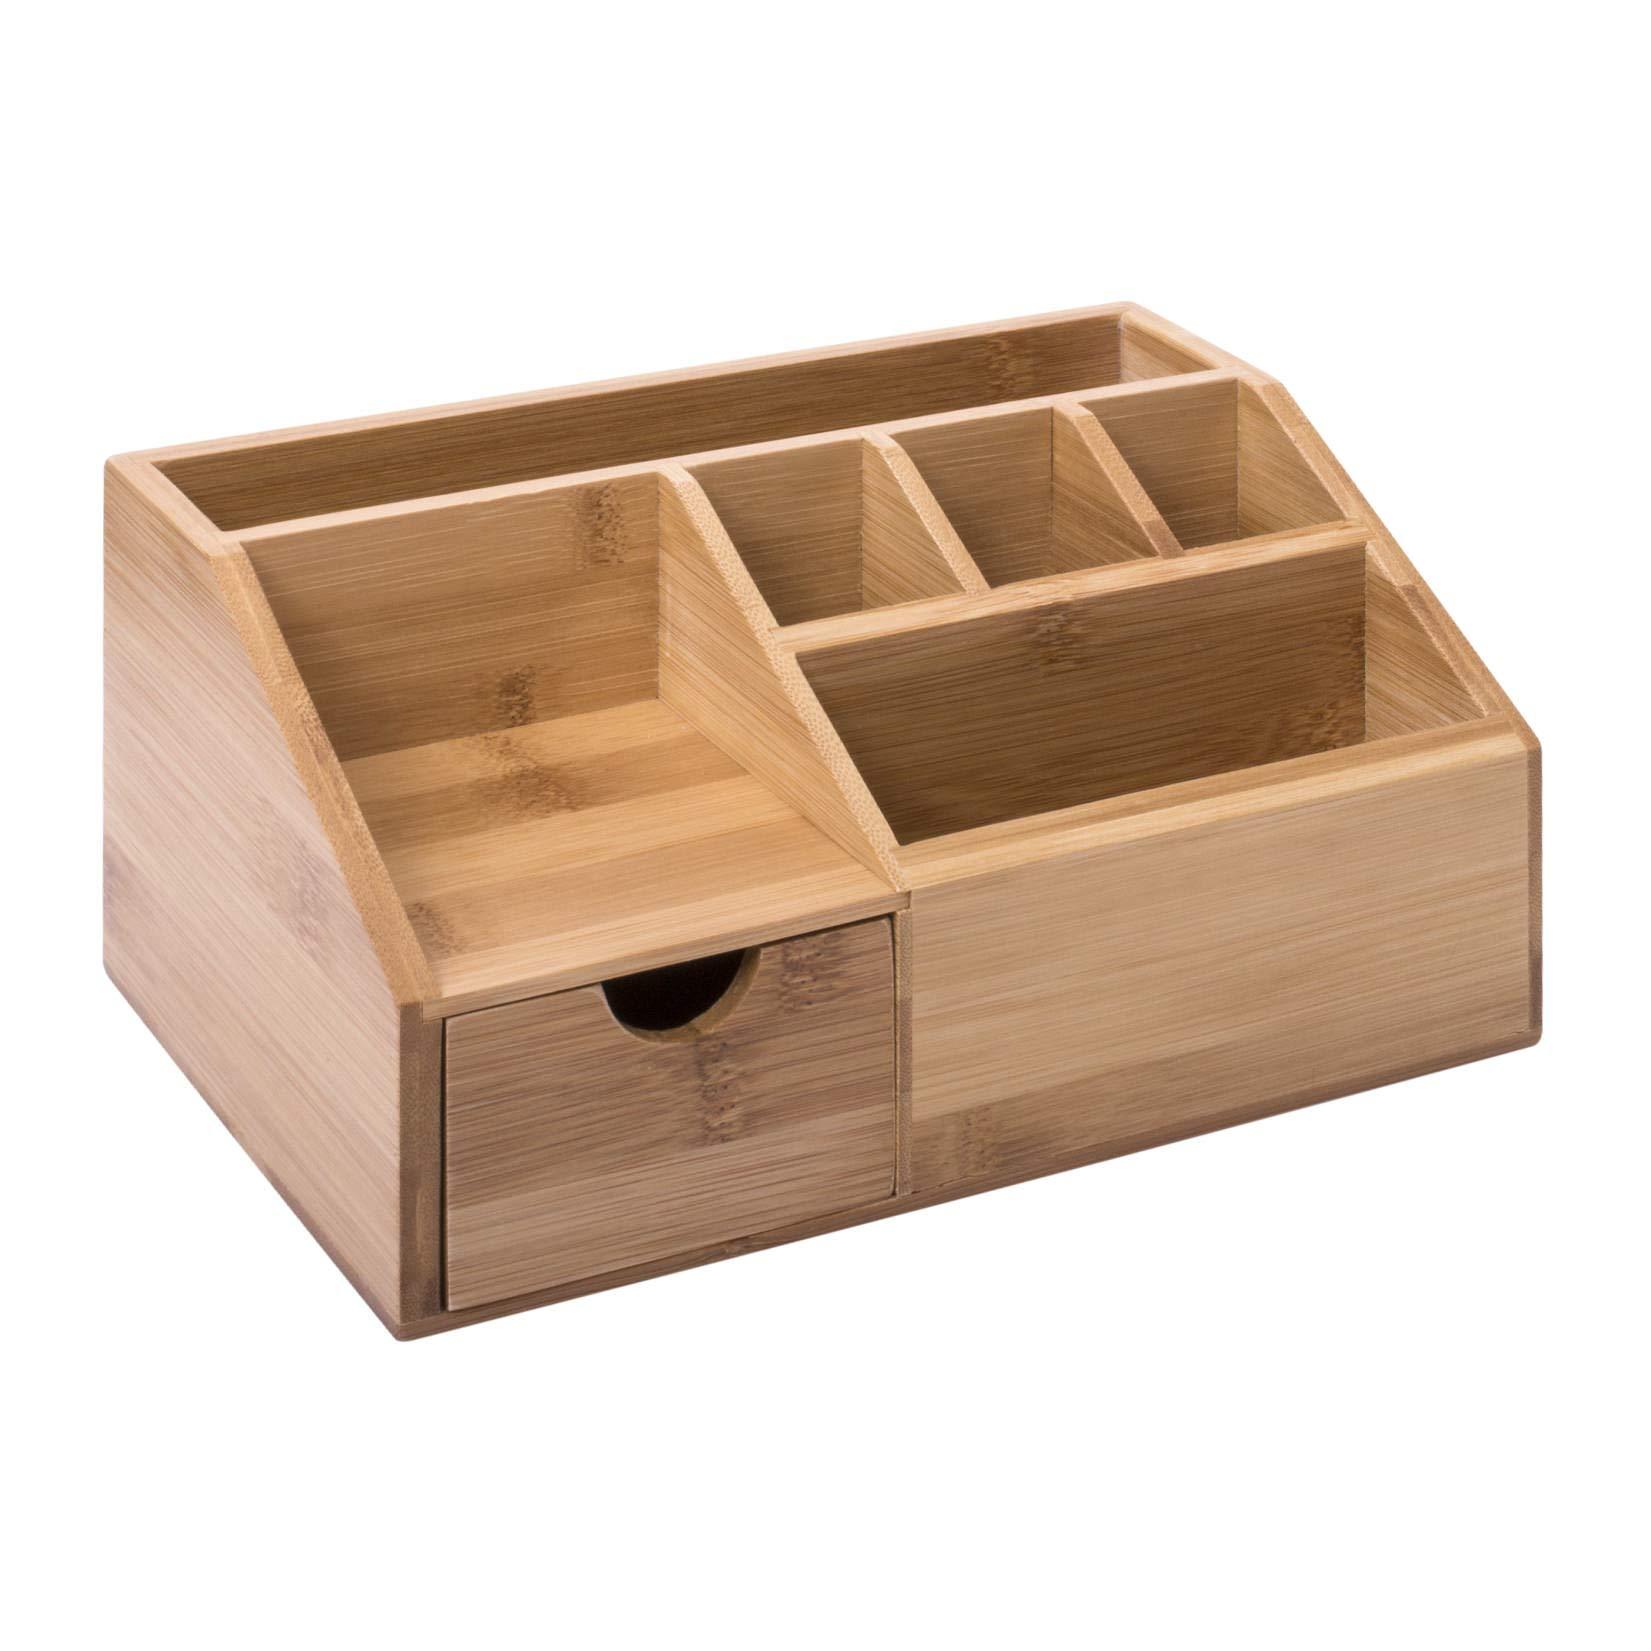 woodluv Bamboo Desk Tidy Organisers Pen Pencil Holder Letter Rack Tablet  Holder, Multi-funtional Storage Organizer, 43.43 x 143 x 43cm